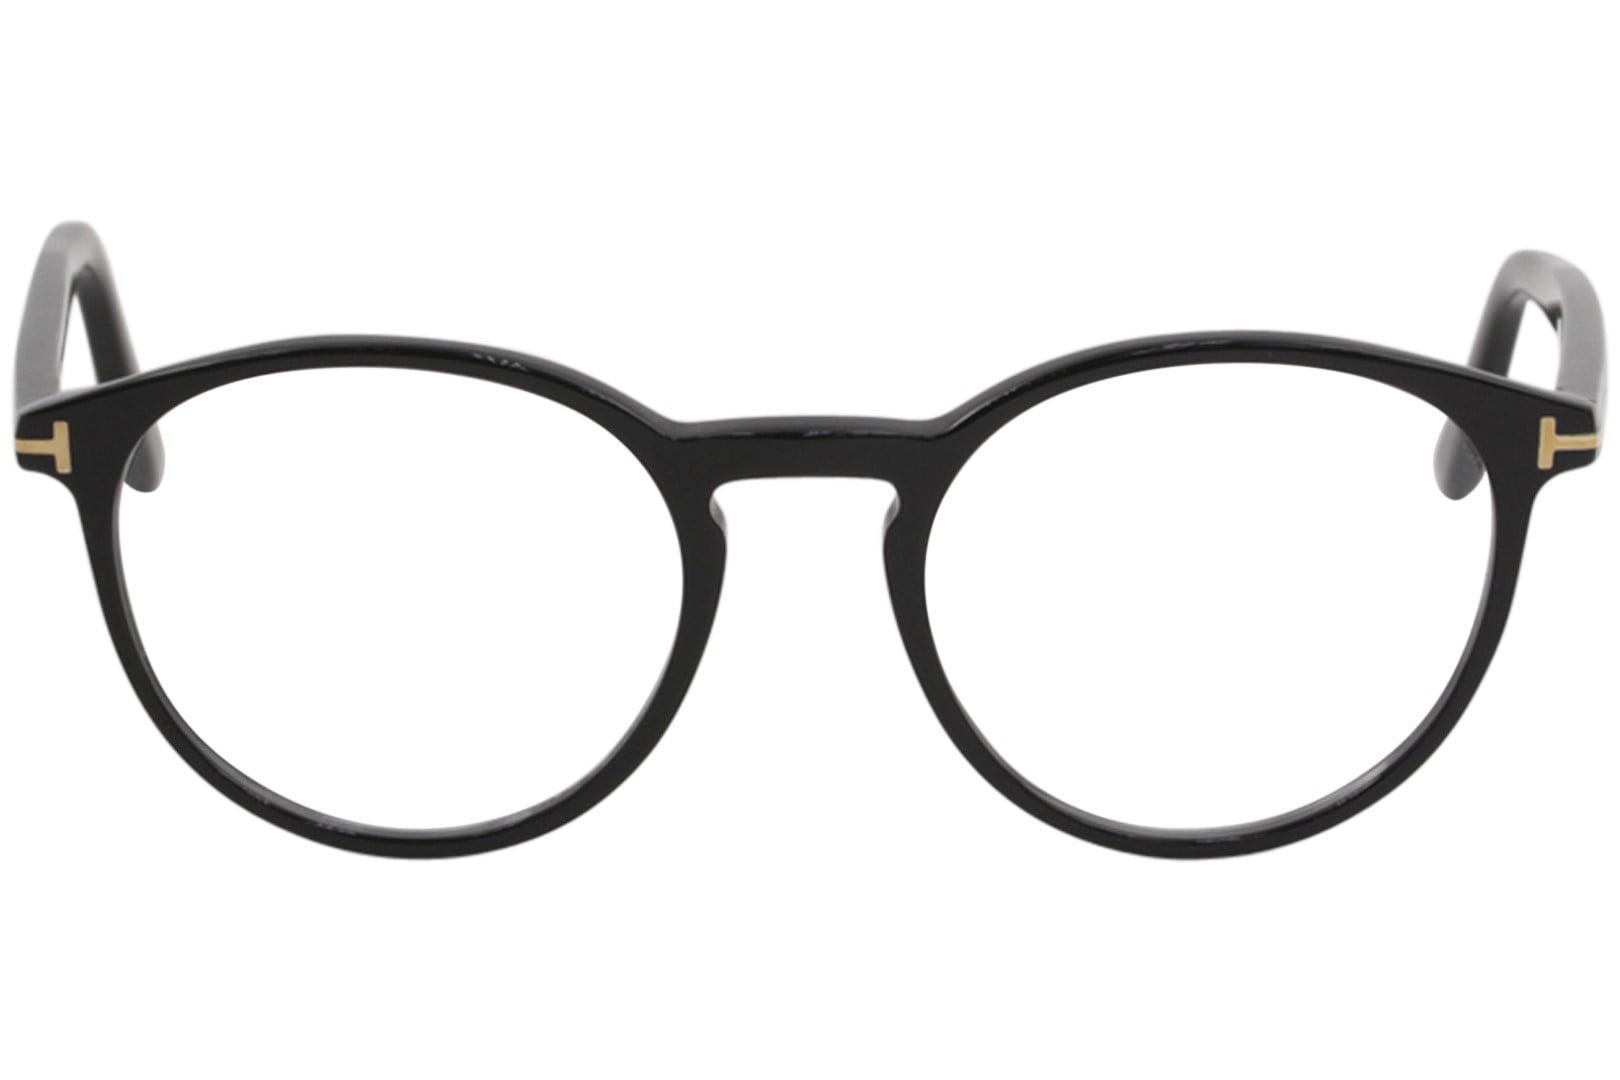 e933ba61040 Eyeglasses Tom Ford FT 5524 001 shiny black - Walmart.com